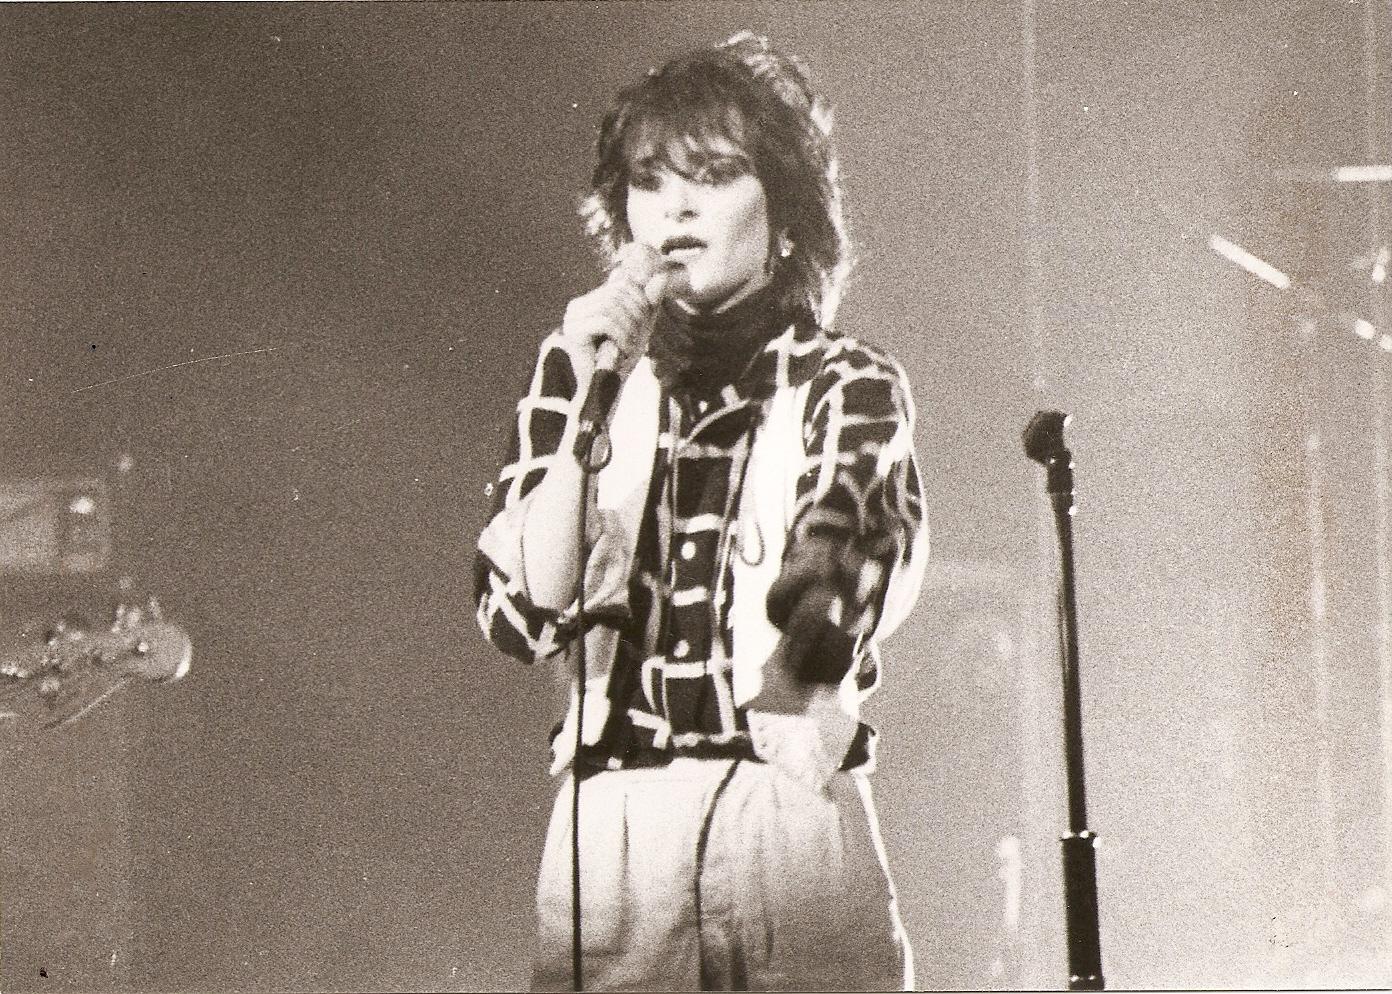 Siouxee and the Banshees - 1980 - Paris Le Palace